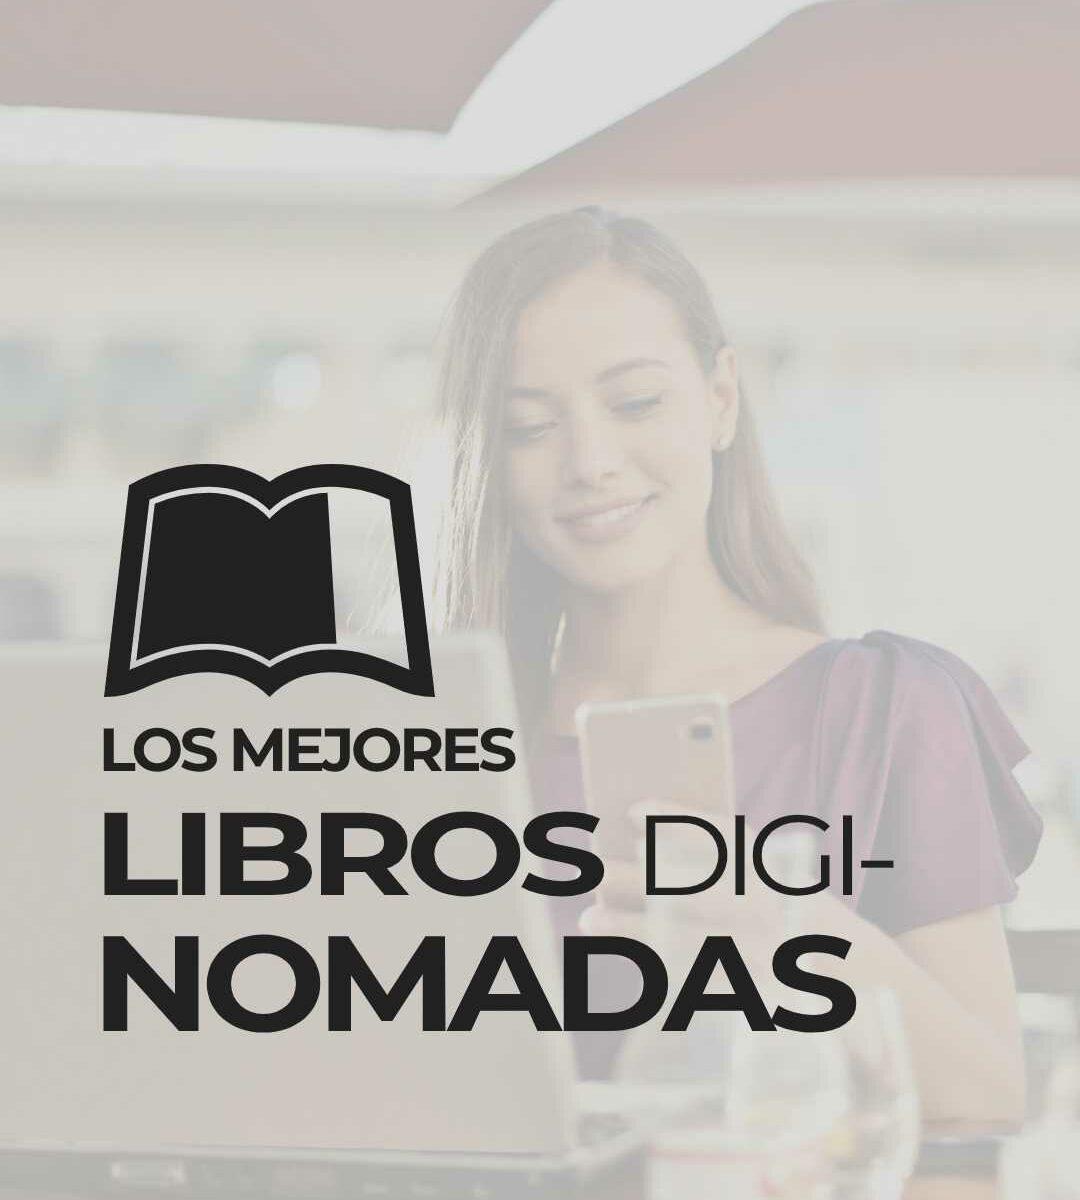 libros para nómadas digitales - recomendados e inspiradores